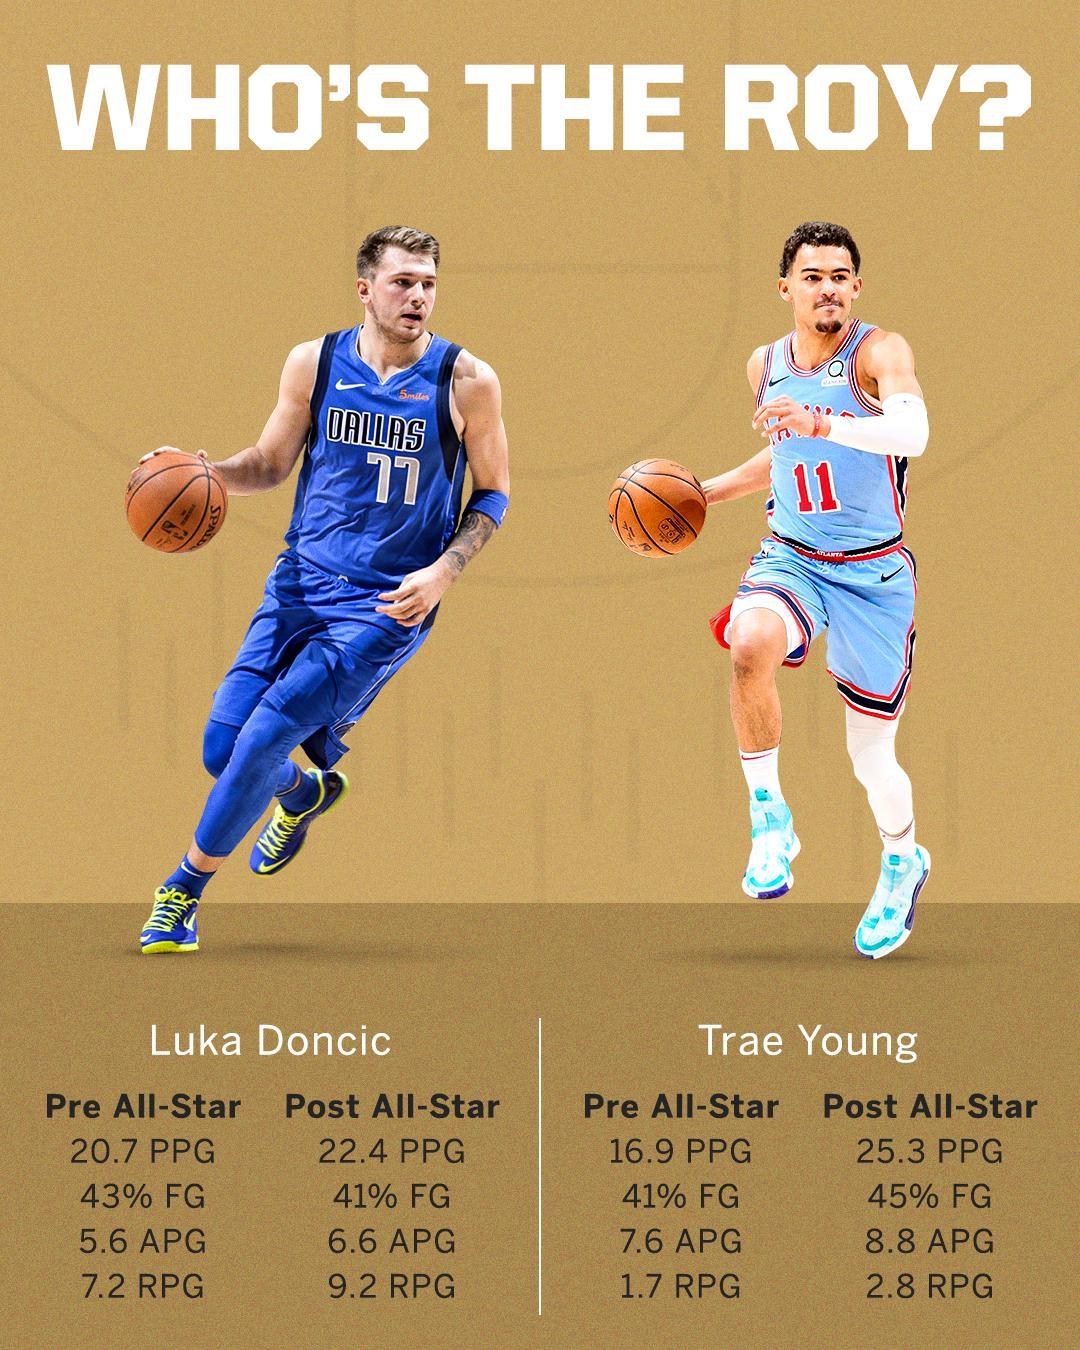 Two worthy rookies. Only one trophy �� https://t.co/yqlkPfrmjE